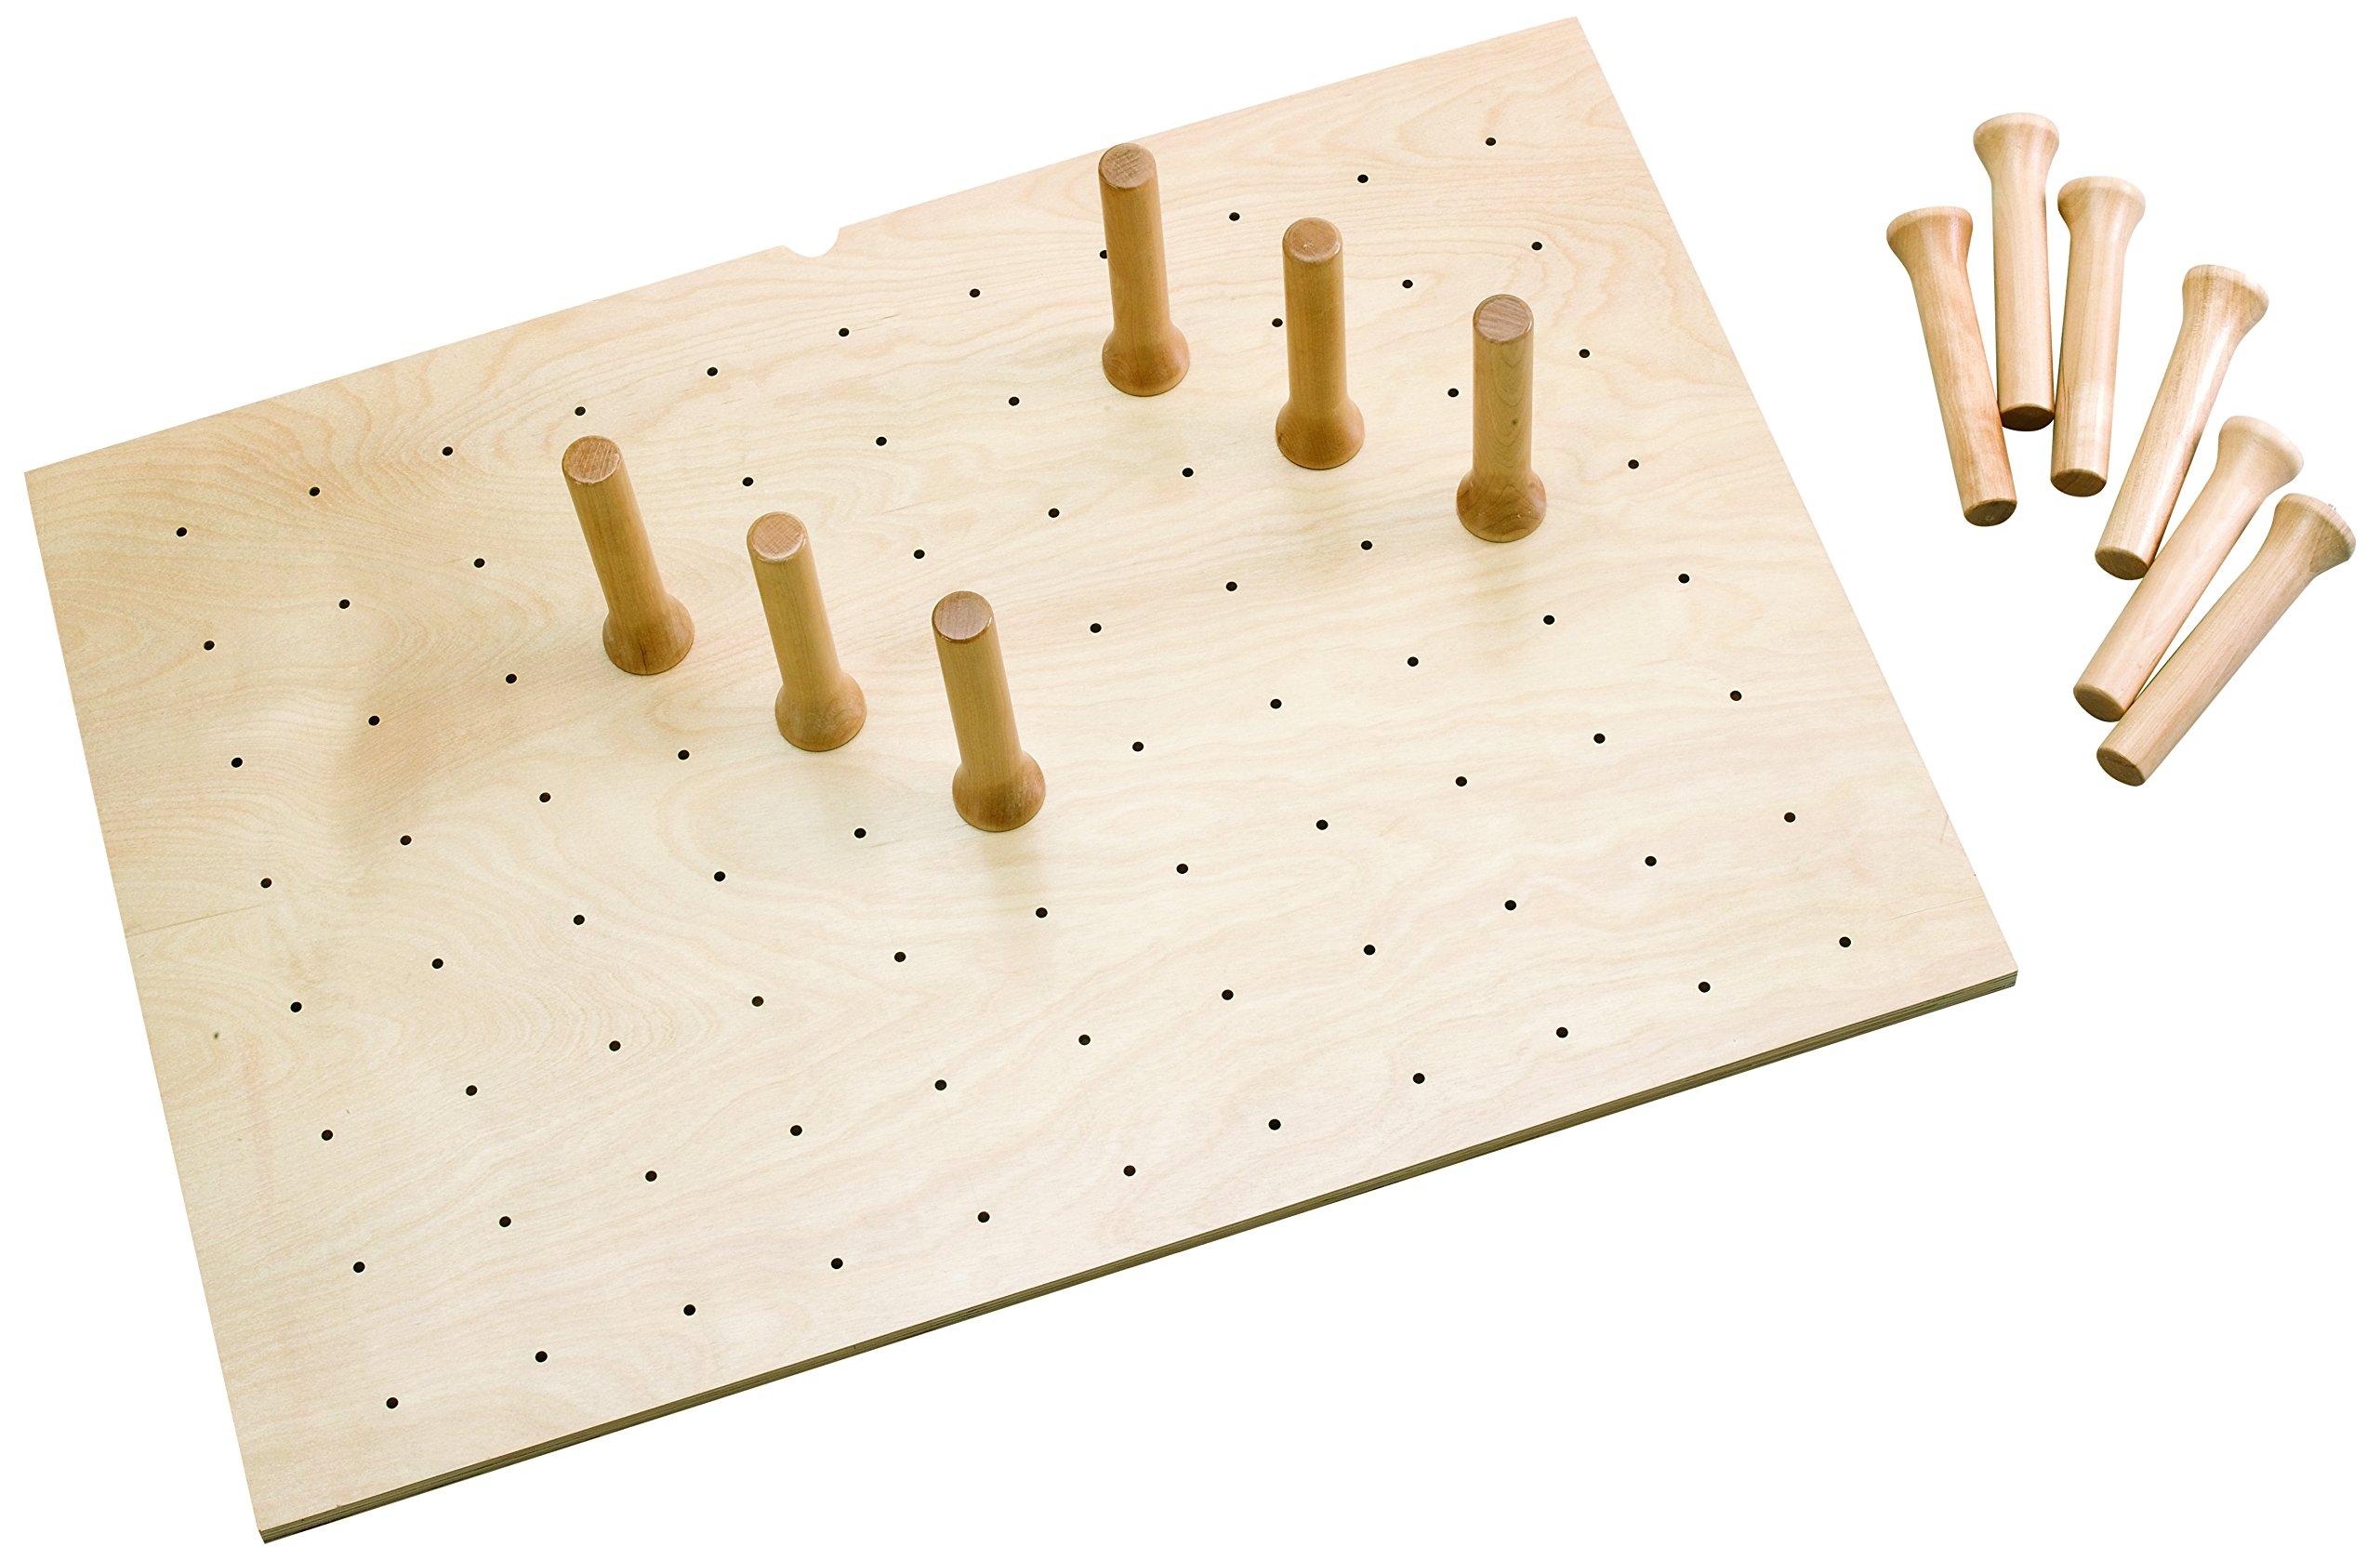 Rev-A-Shelf 39 x 21 Wood Peg Board Drawer Organizers, Natural